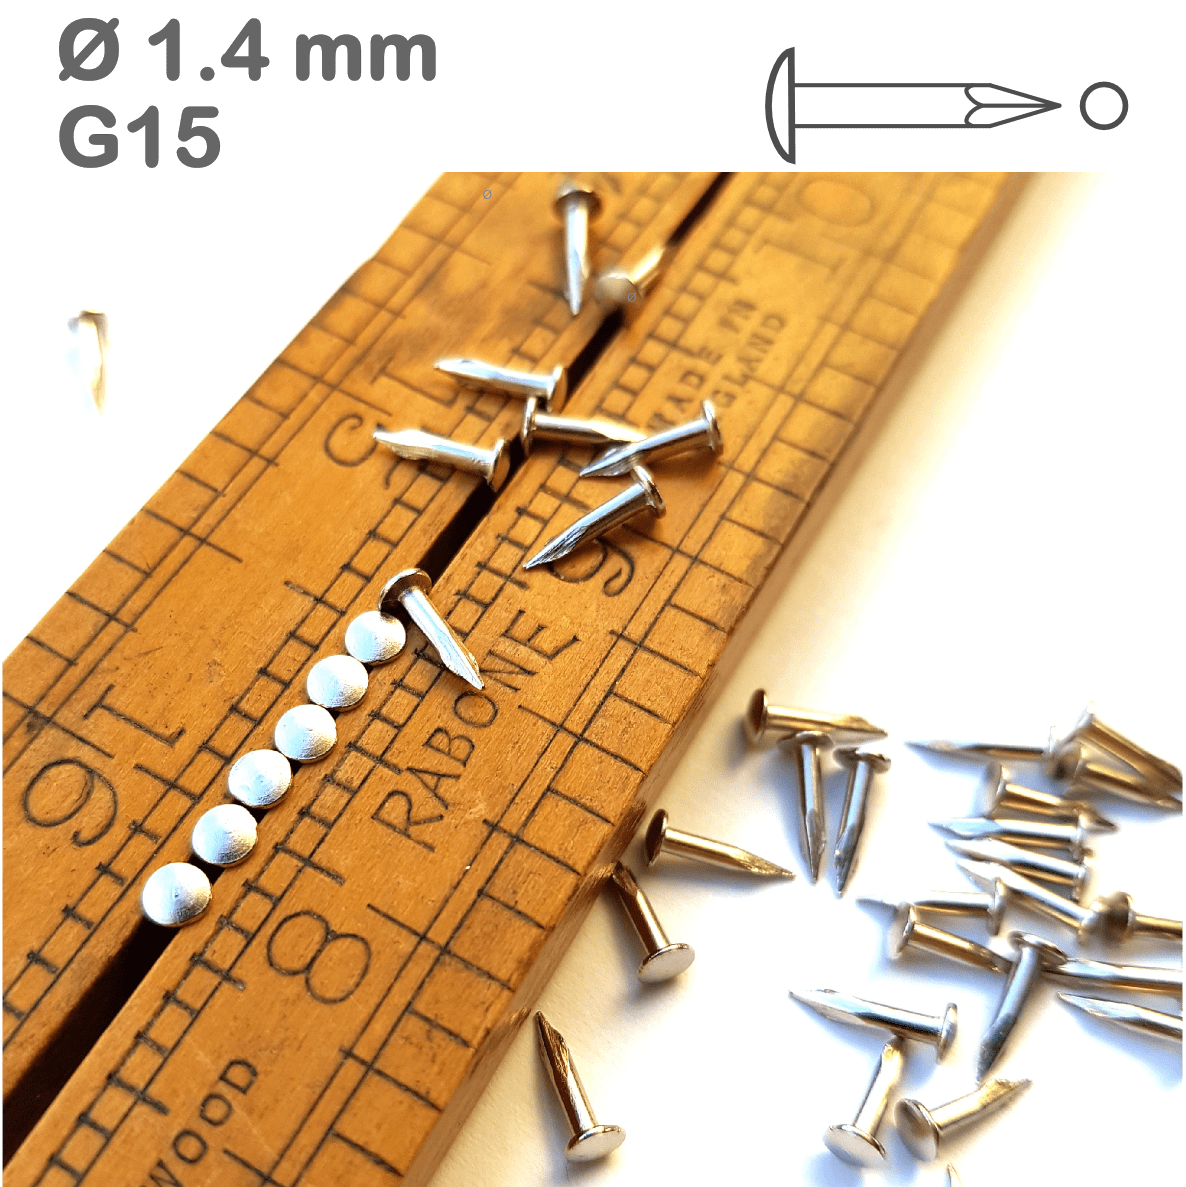 Shiny Silver Nickel-Plated Nails